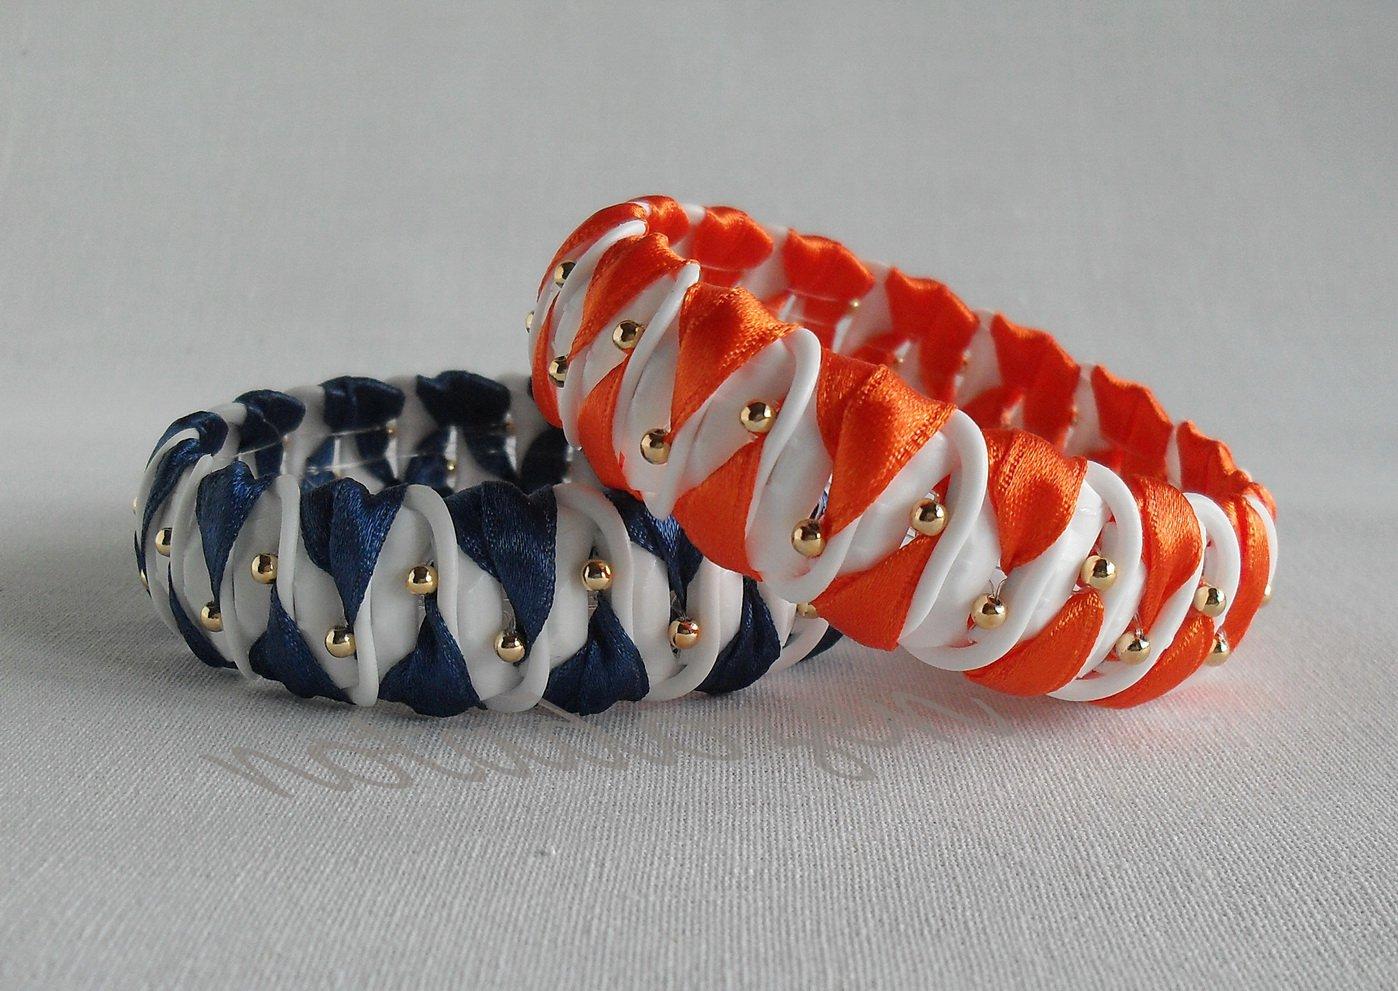 Recycled Bottle Caps Bracelet/women bangle(11)-orange/navy blue chevron wrapped and gold beads